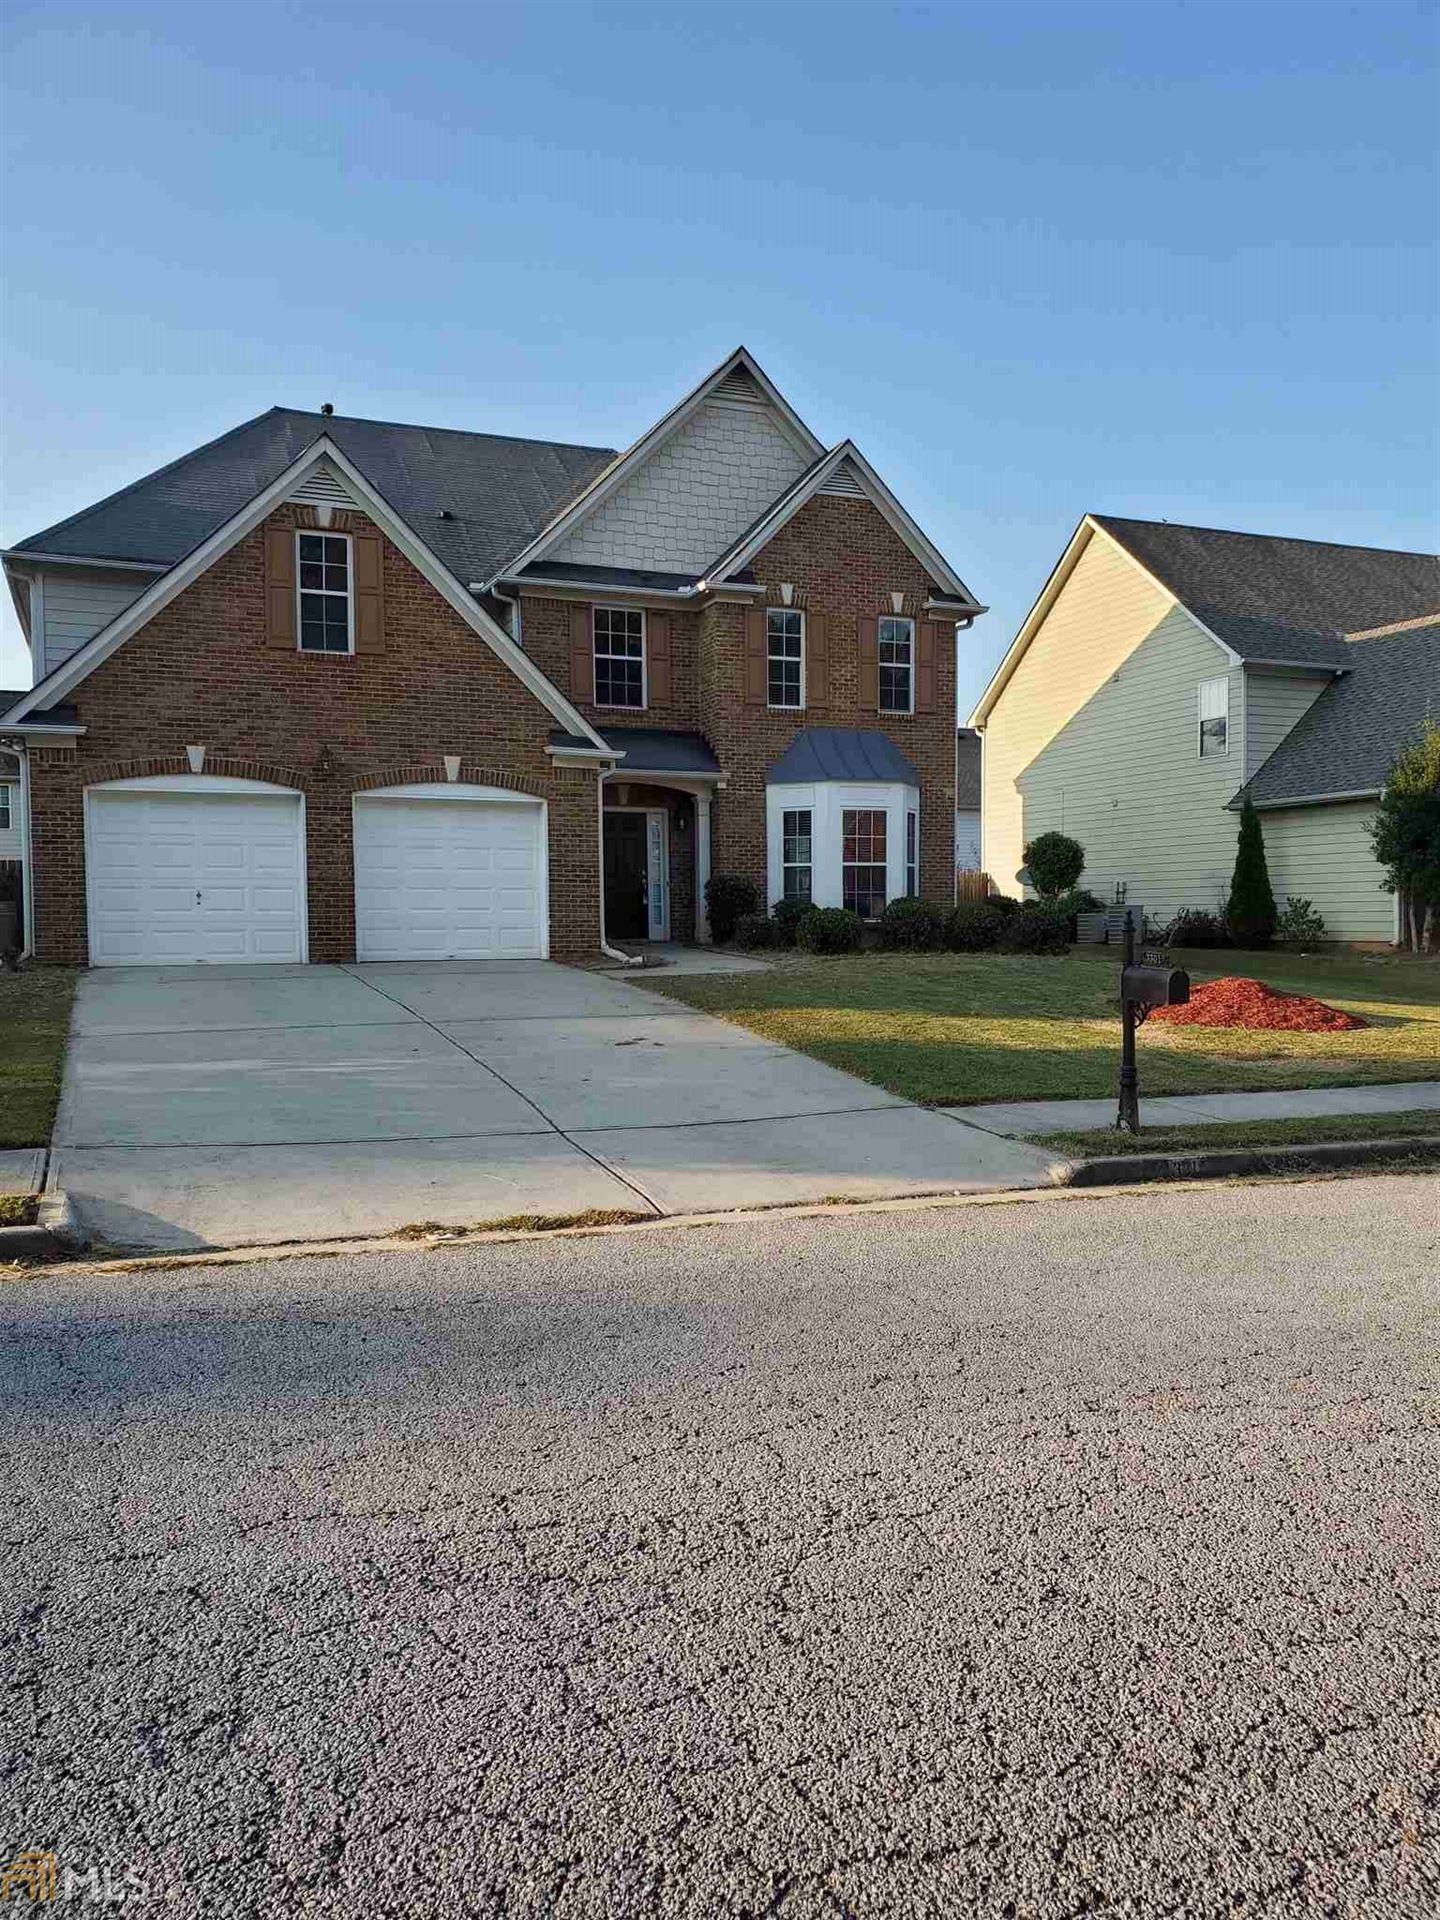 3301 Kessock Ridge Trl, Snellville, GA 30039 - MLS#: 8870209